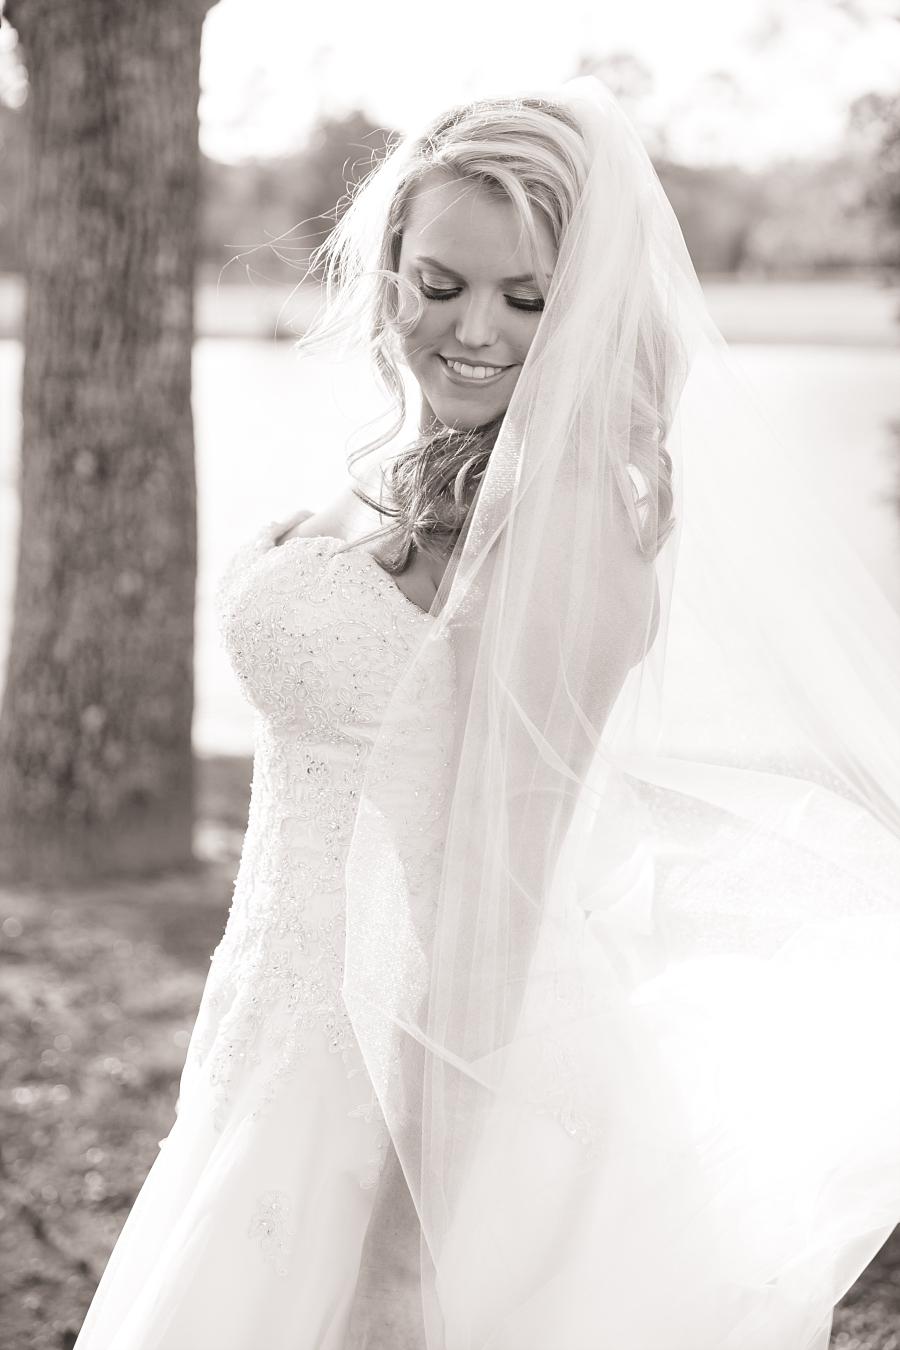 Stacy-Anderson-Photography-Balmorhea-Tomball-Wedding-Photographer_0012.jpg